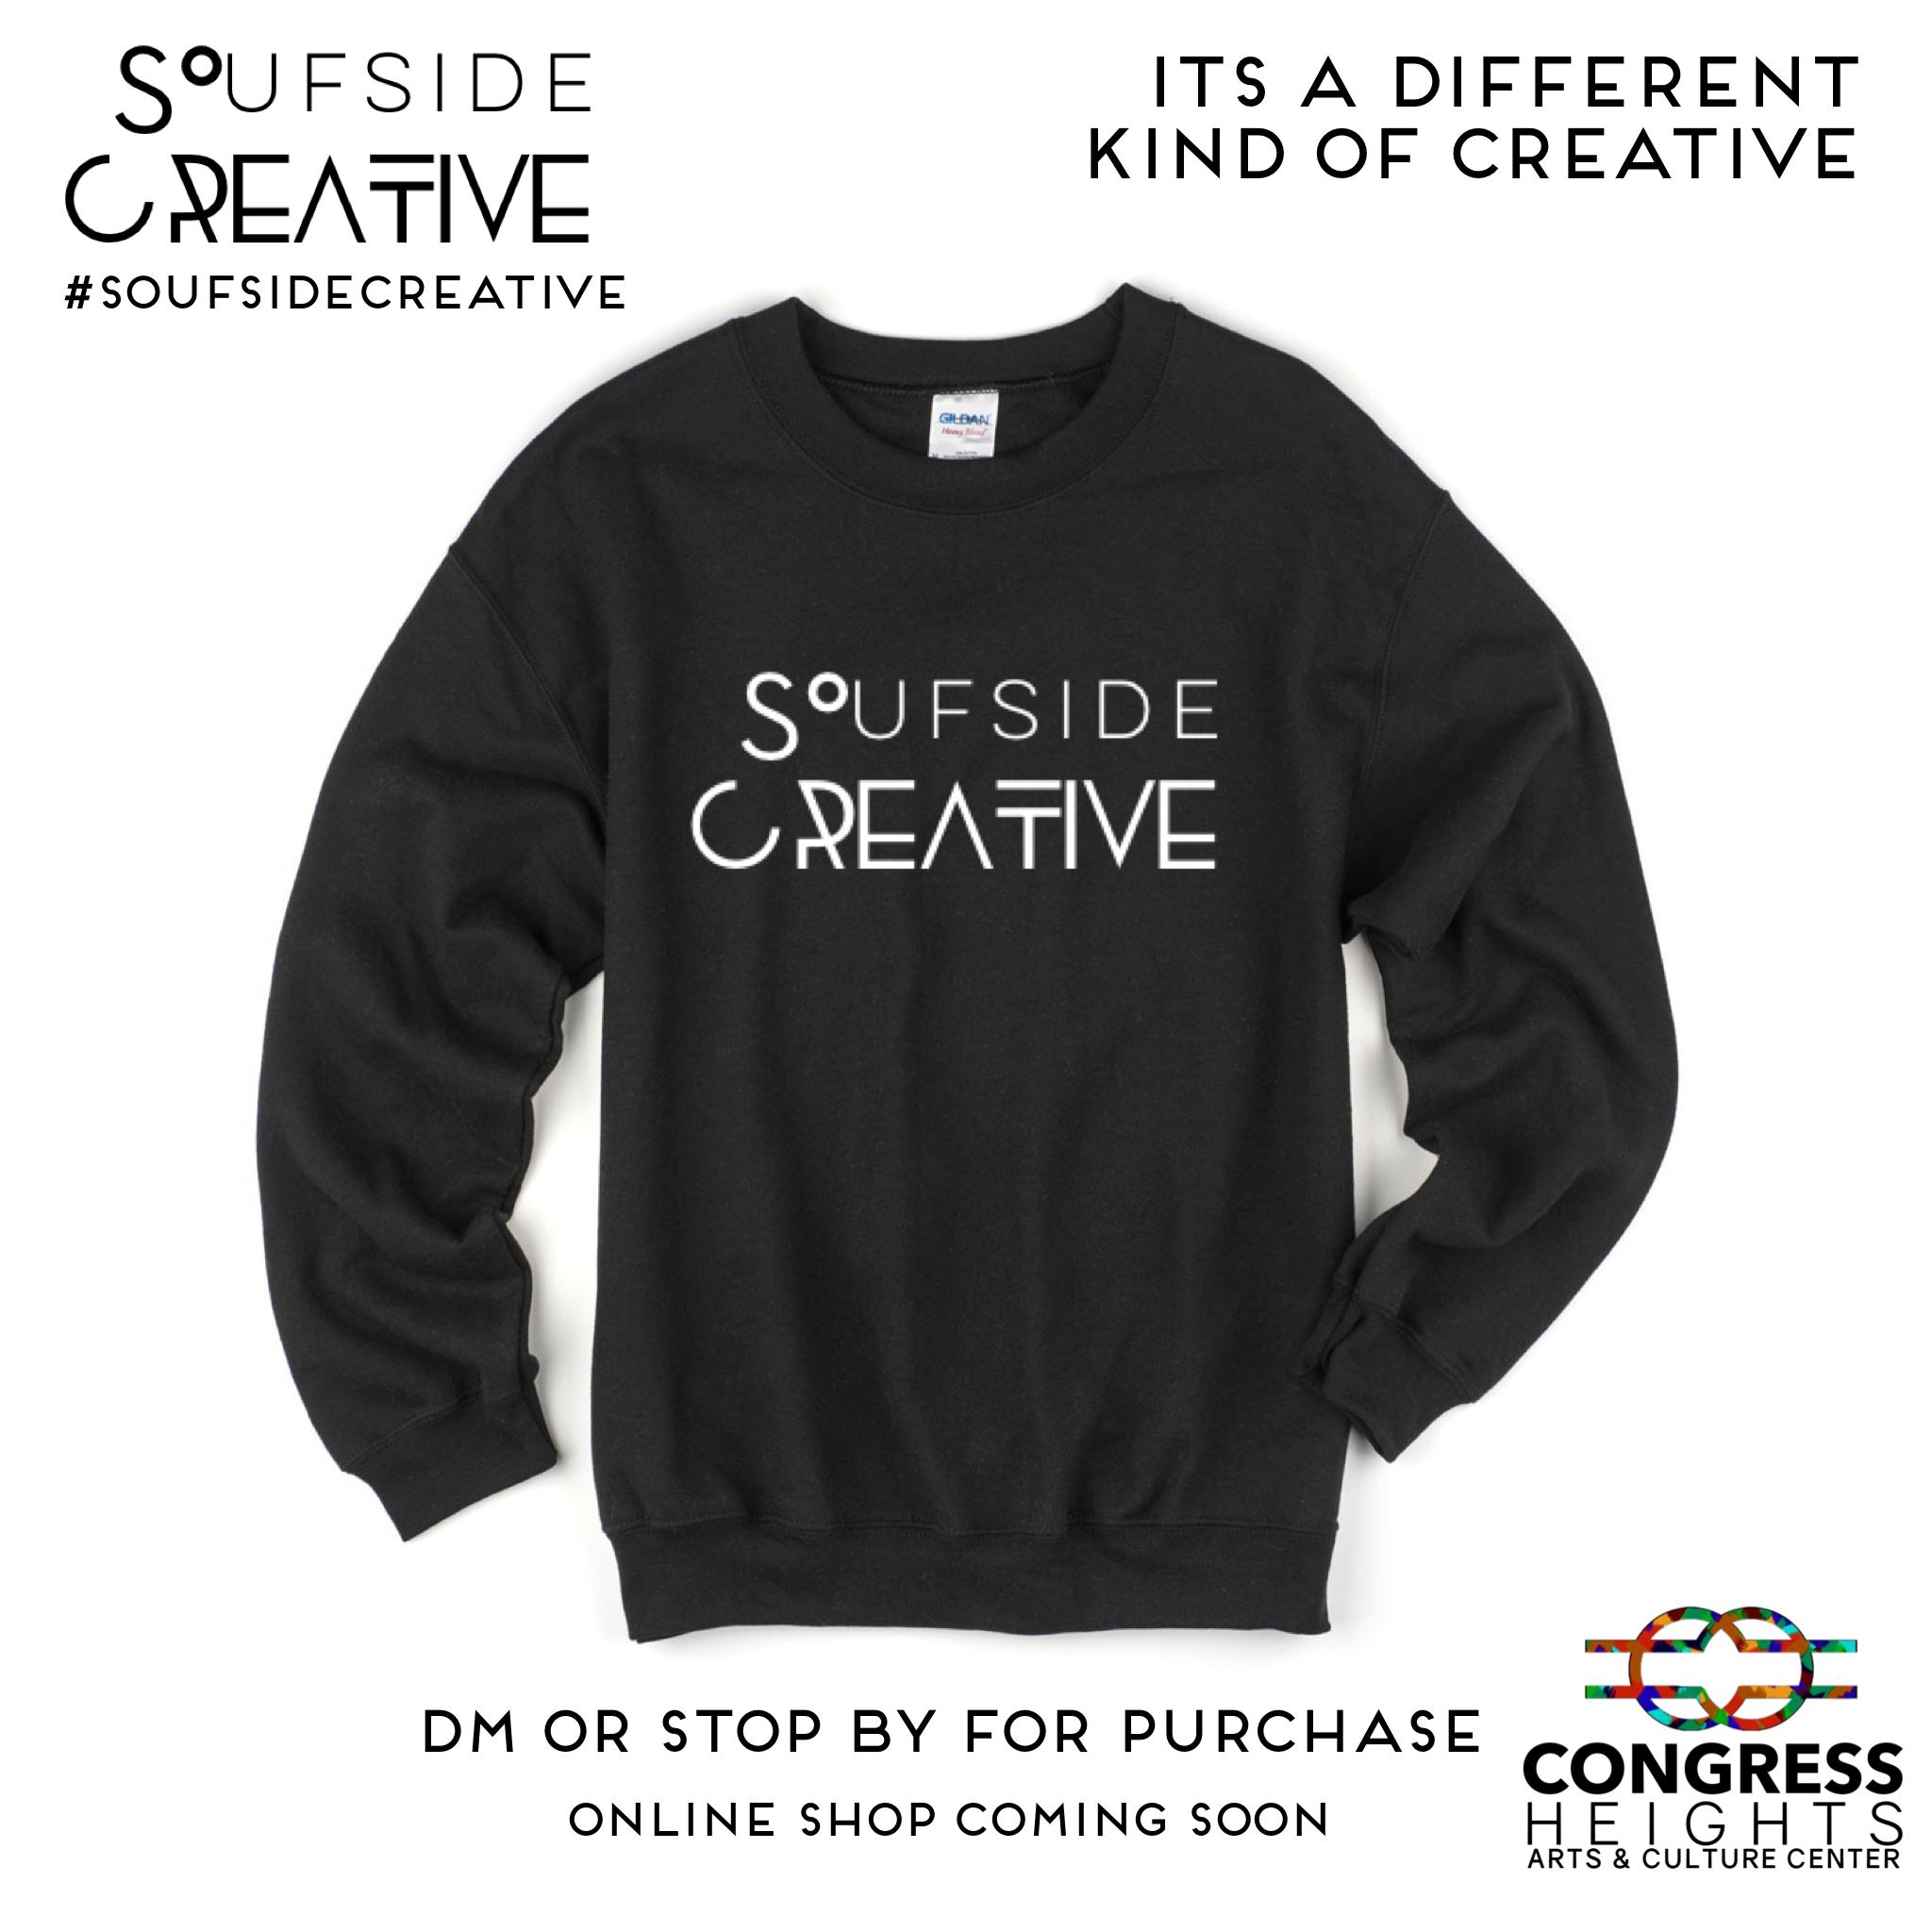 Soufside Creative